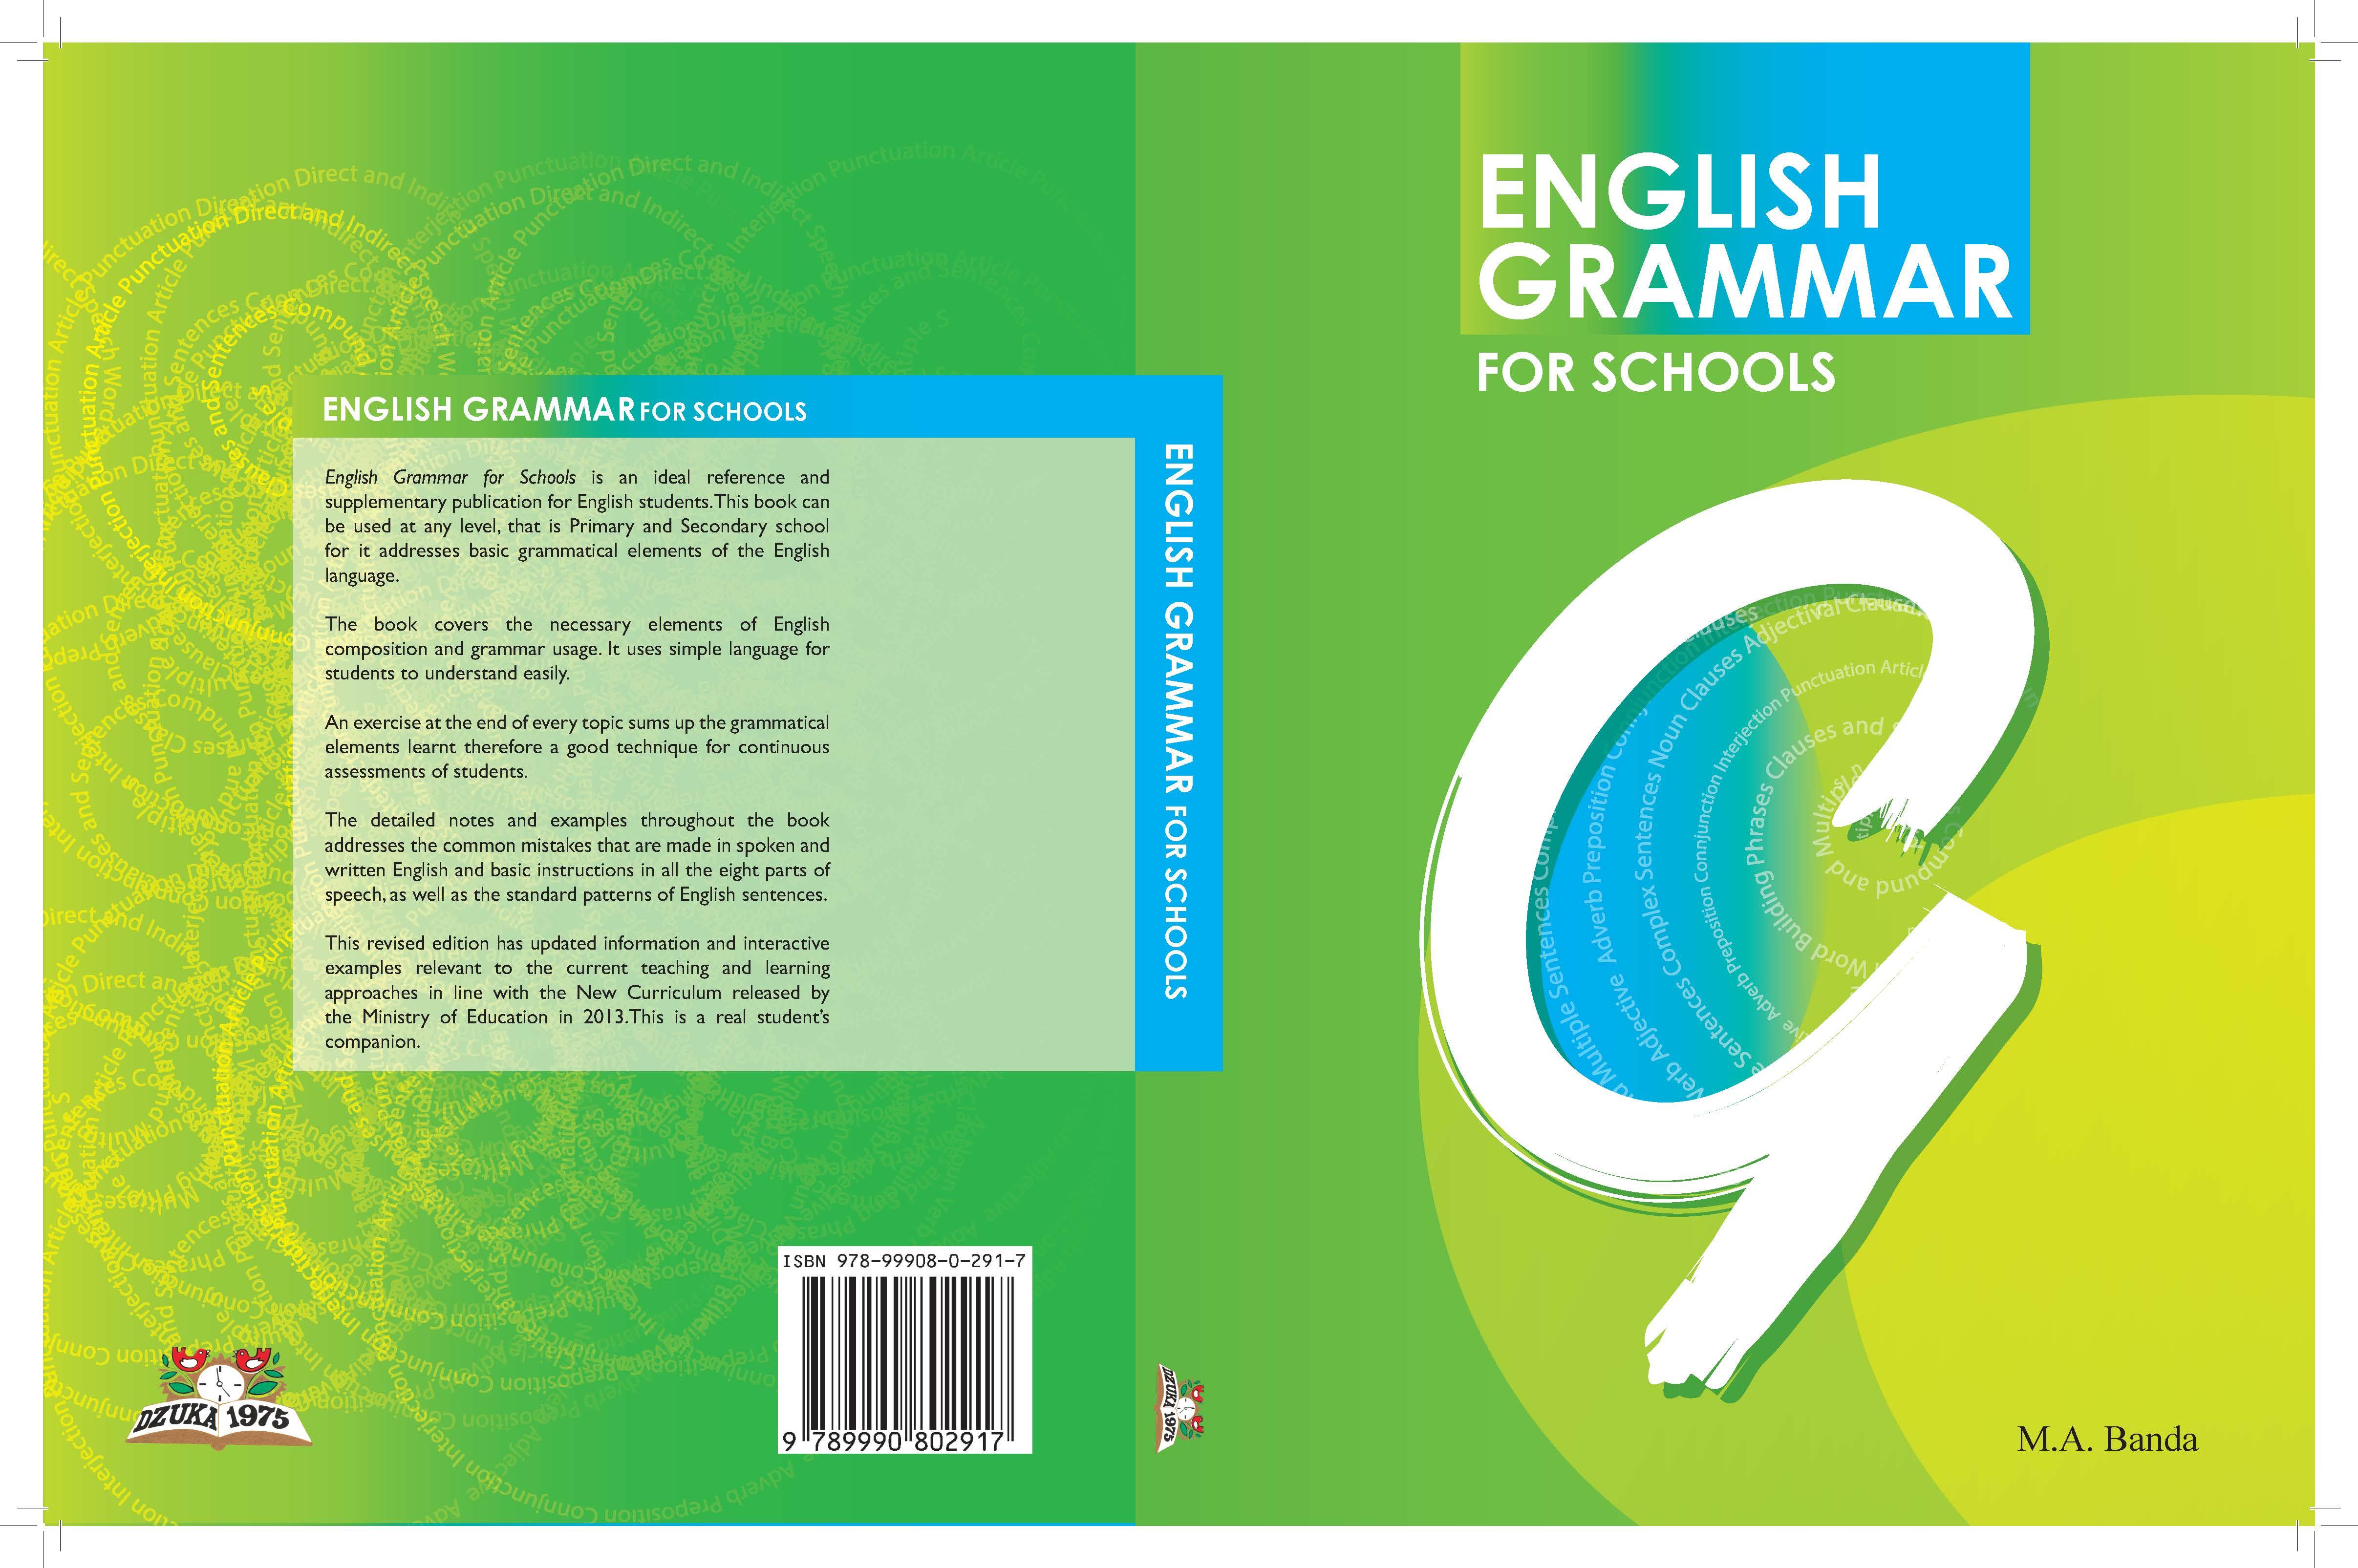 ENGLISH-GRAMMAR-COVER